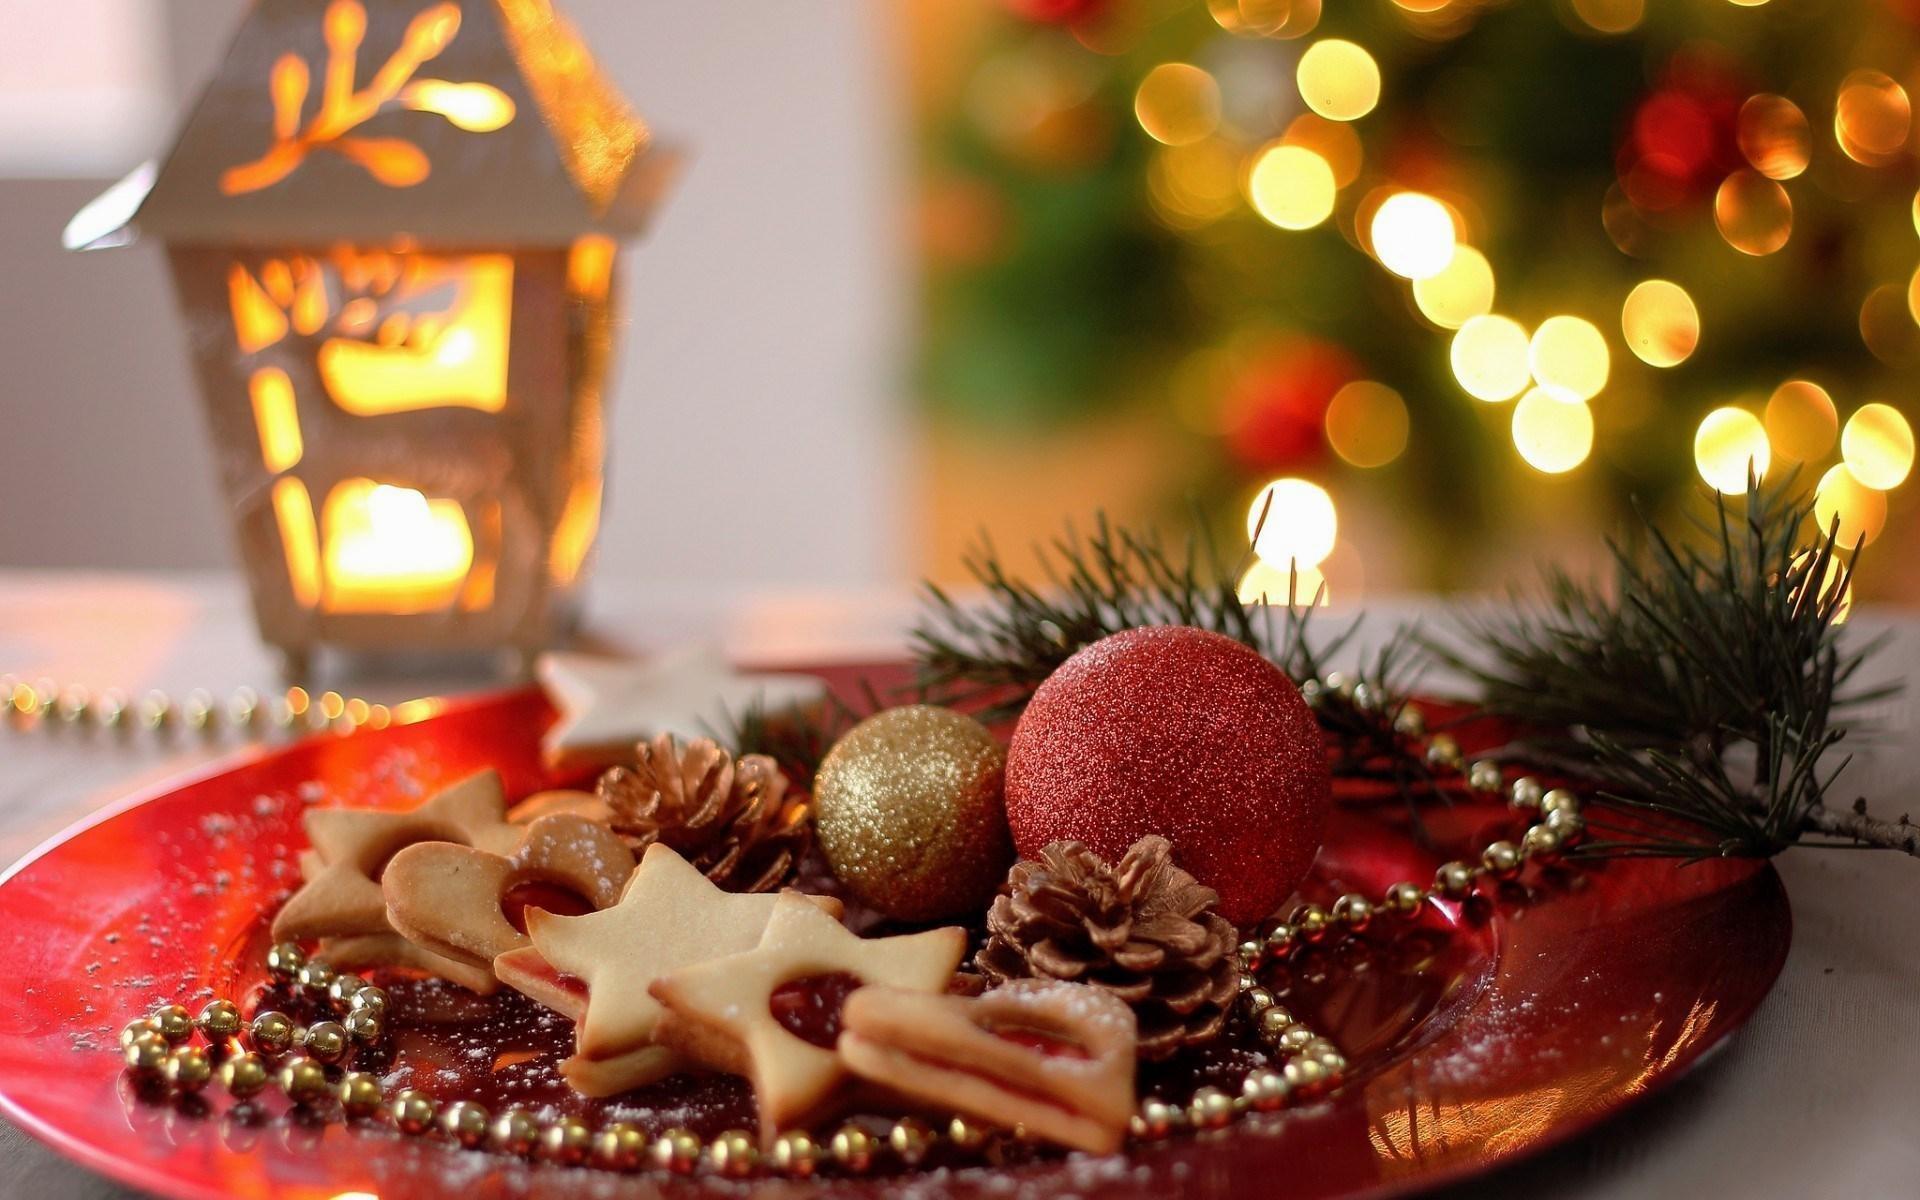 Christmas-lights-cookies-winter-new-year